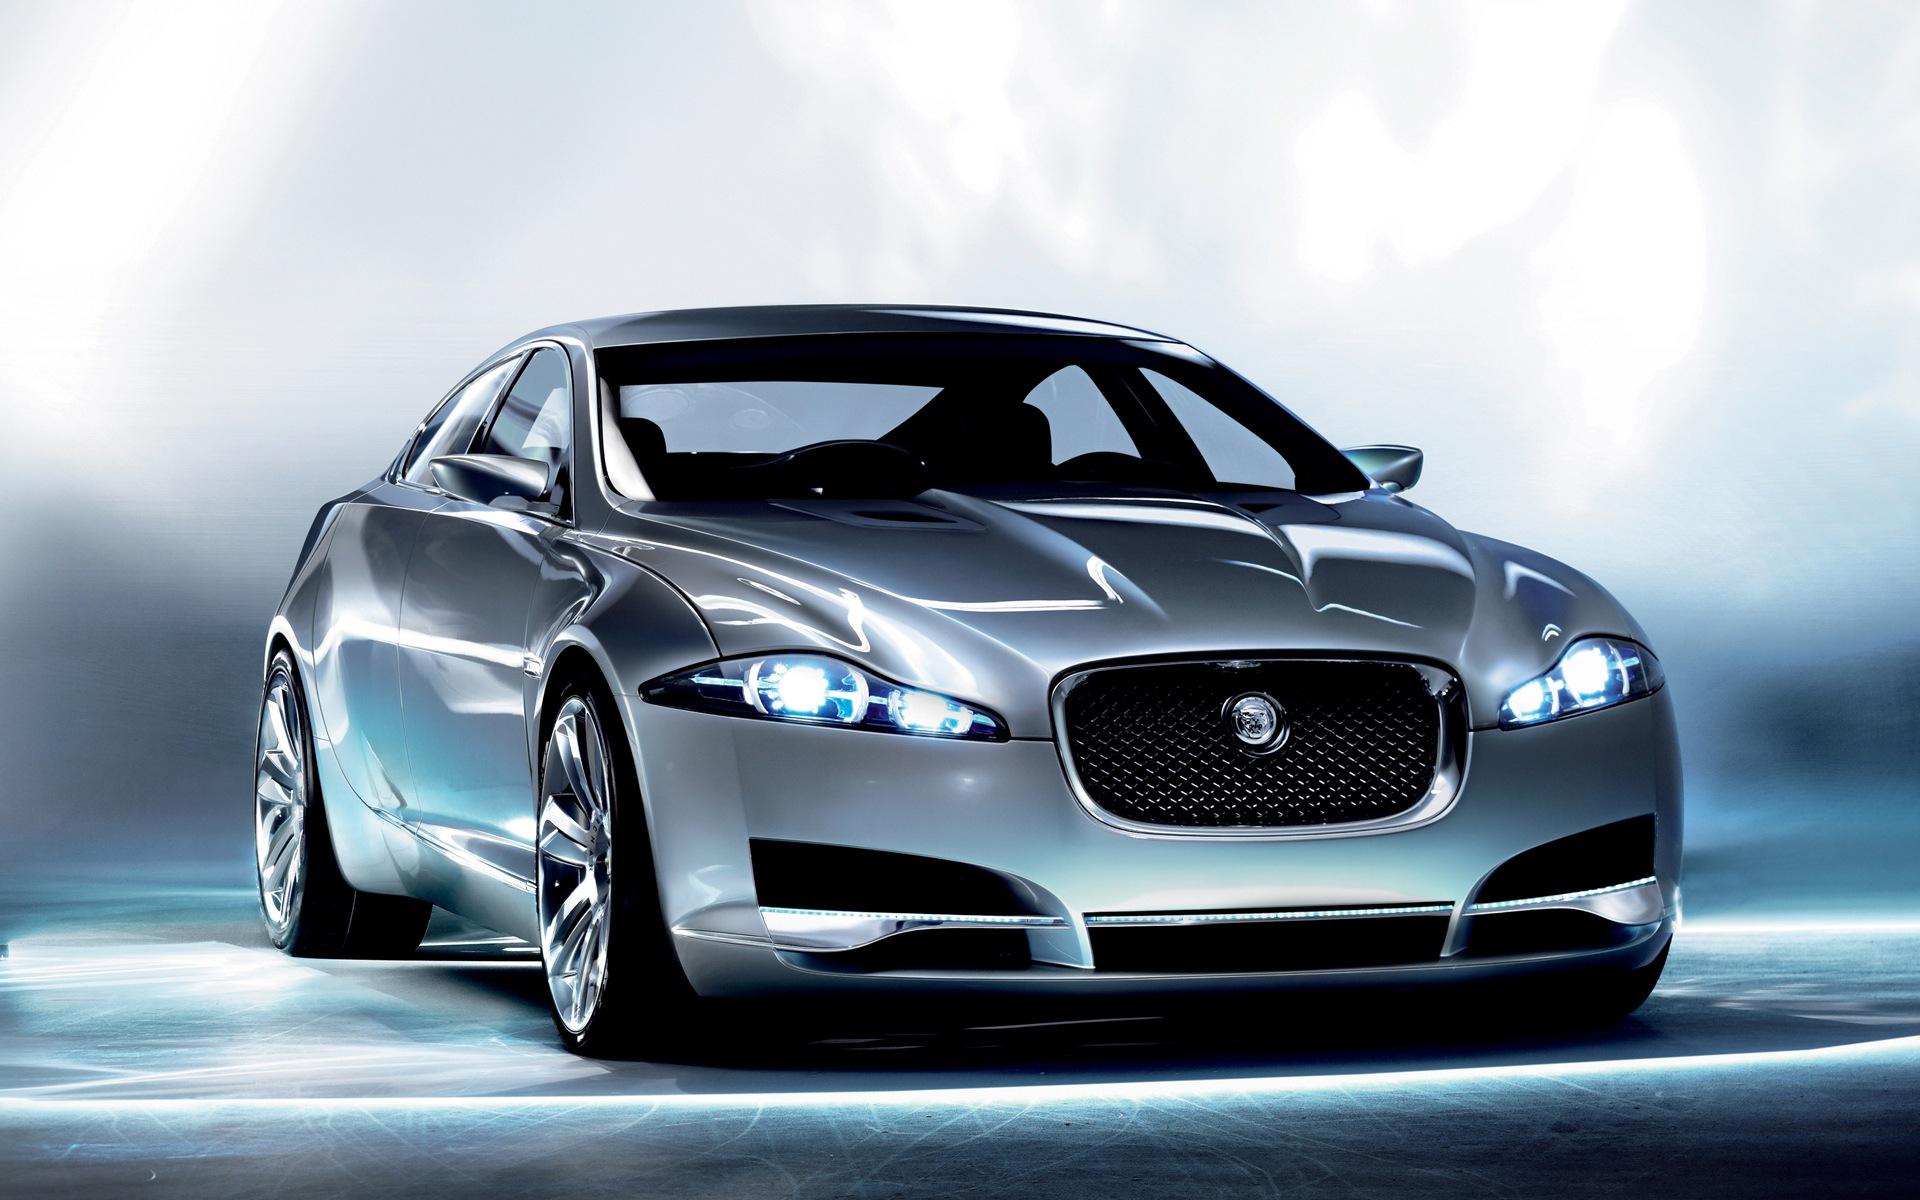 Hd wallpaper jaguar - Jaguar C Xf Concept 3 Wallpapers Hd Wallpapers